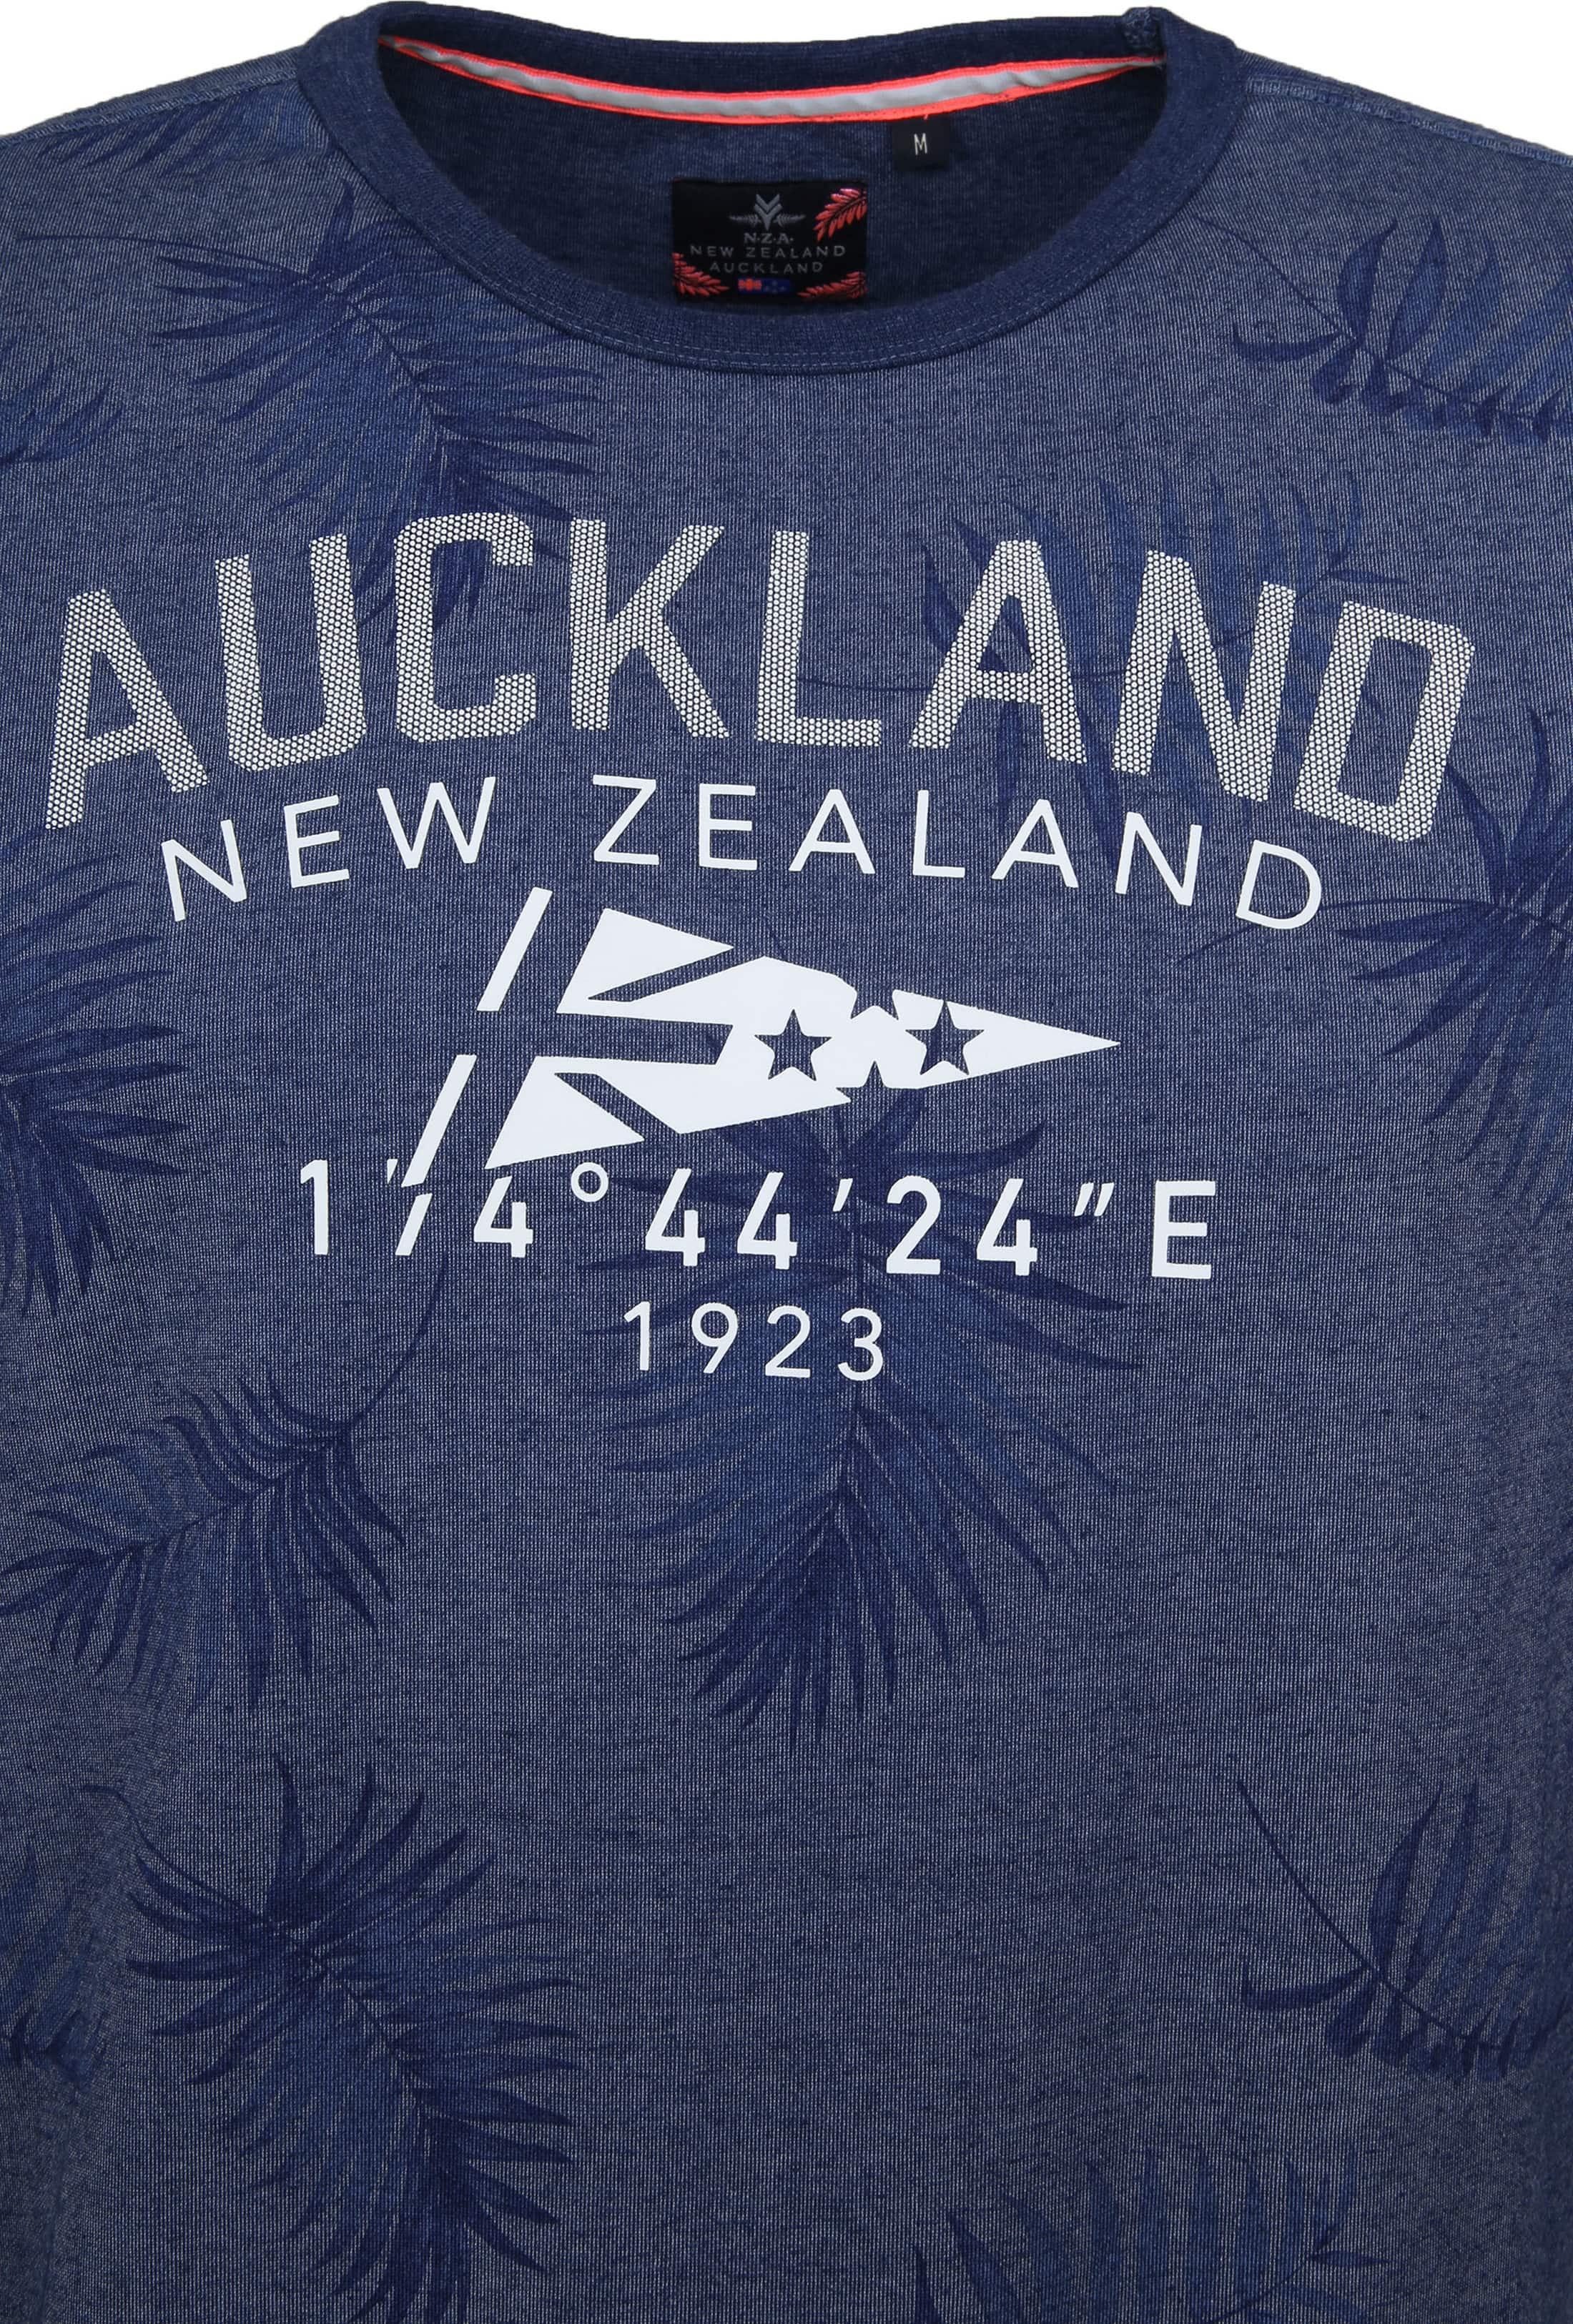 NZA Sweater Tahakopa Blue foto 1